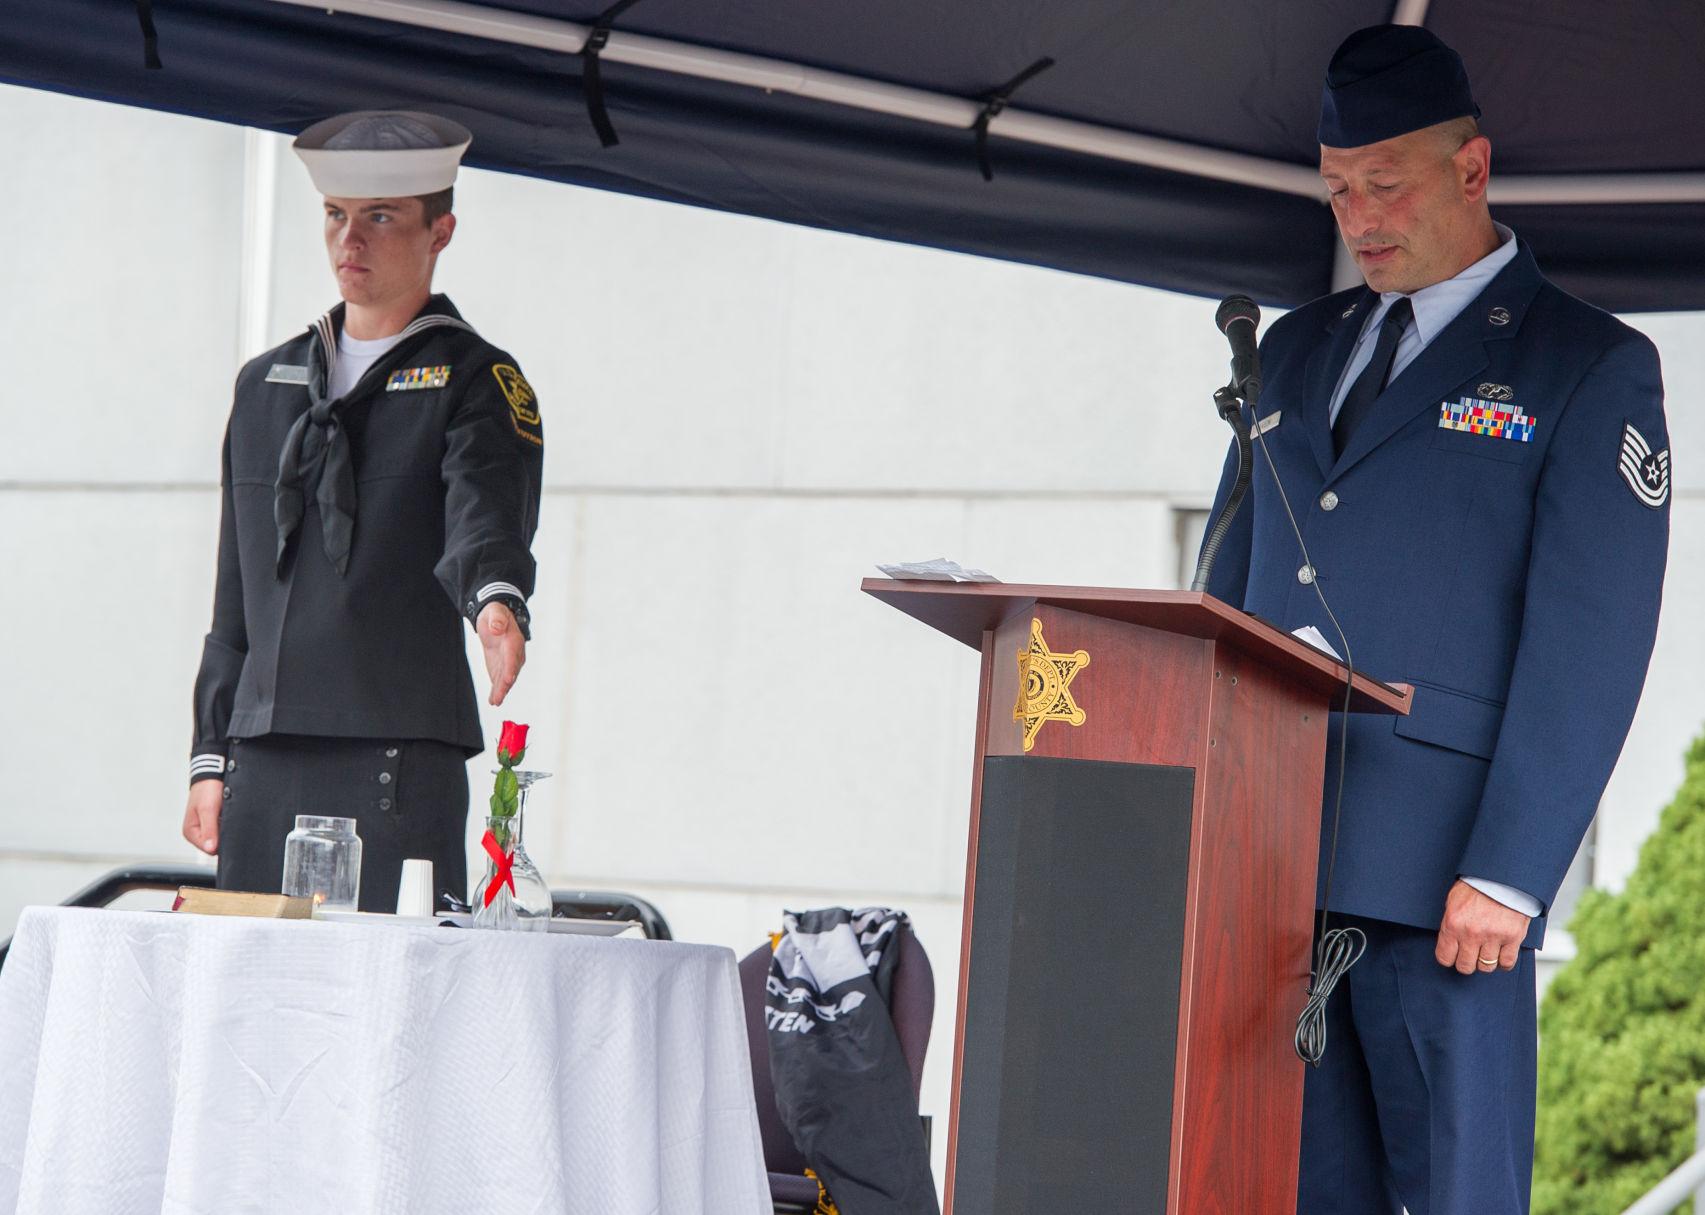 SLIDESHOW Essex County Sherriff hosts POWMIA Ceremony